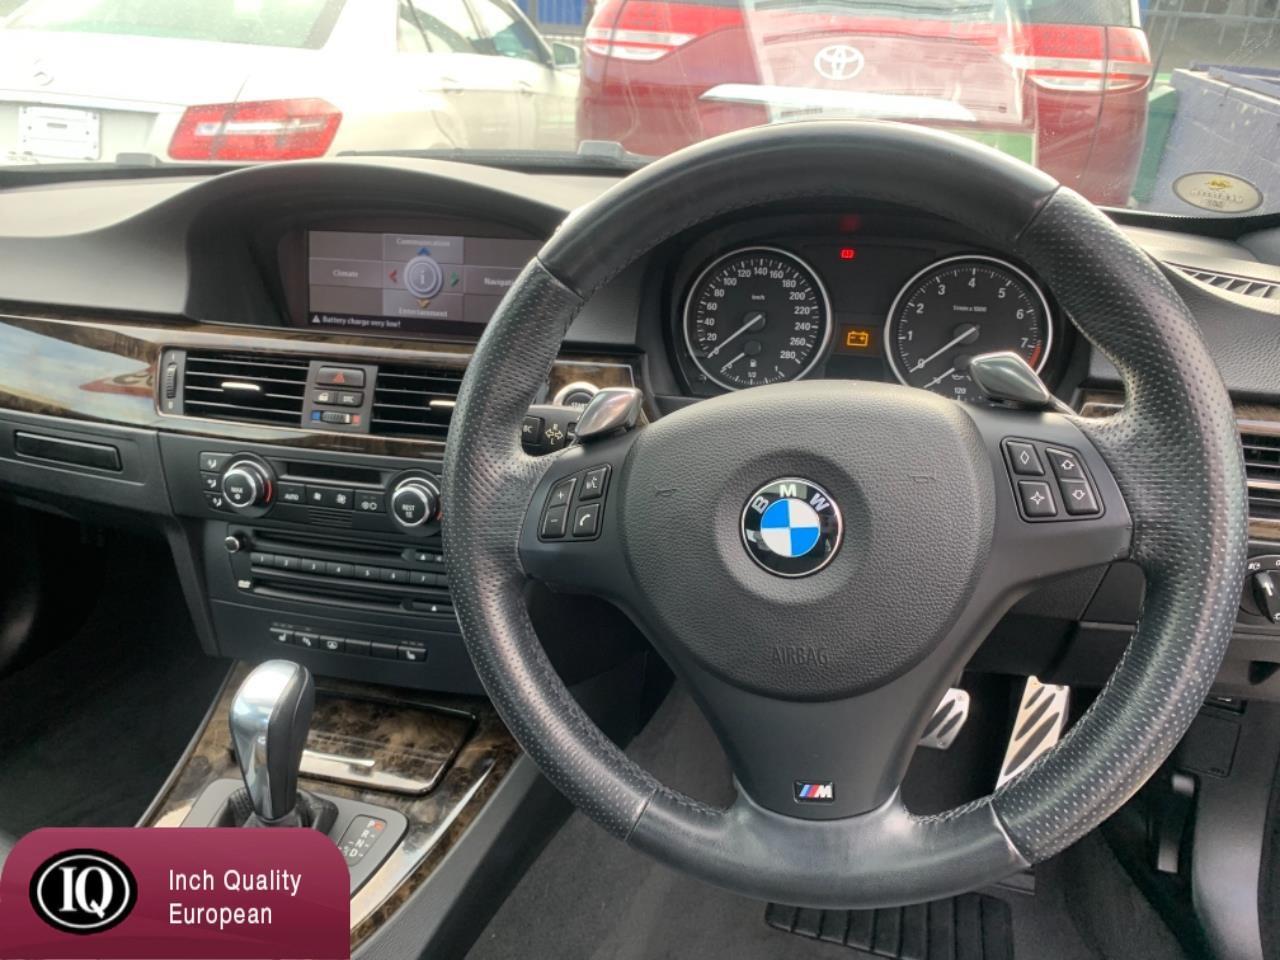 image-6, 2009 BMW 335i 3.0 Twin Turbo M Sport at Christchurch